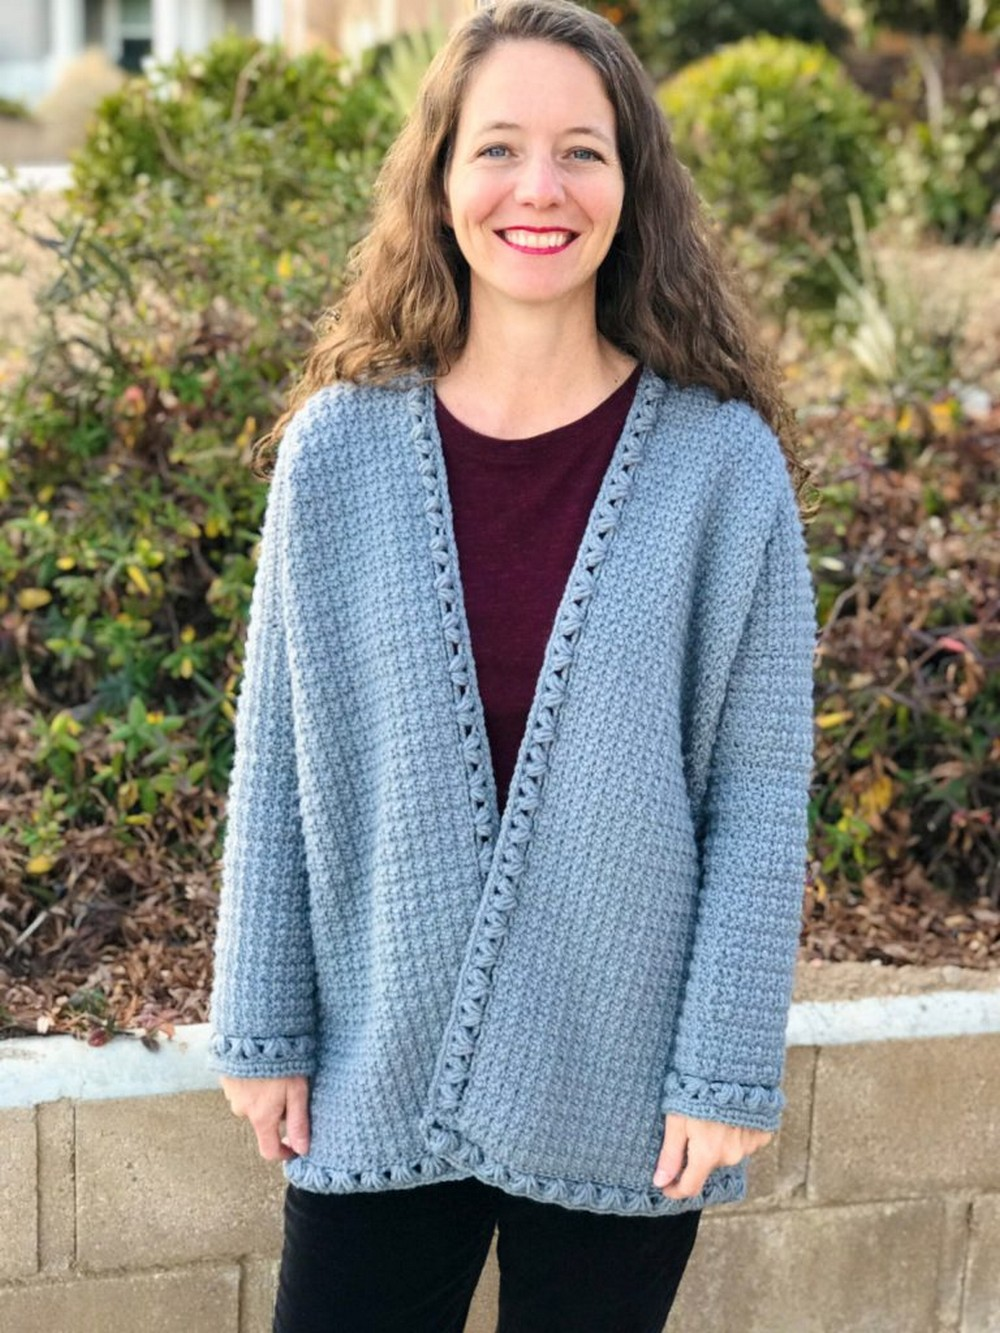 Free Oversized Crochet Cardigan Pattern In Sizes Xs-3xl